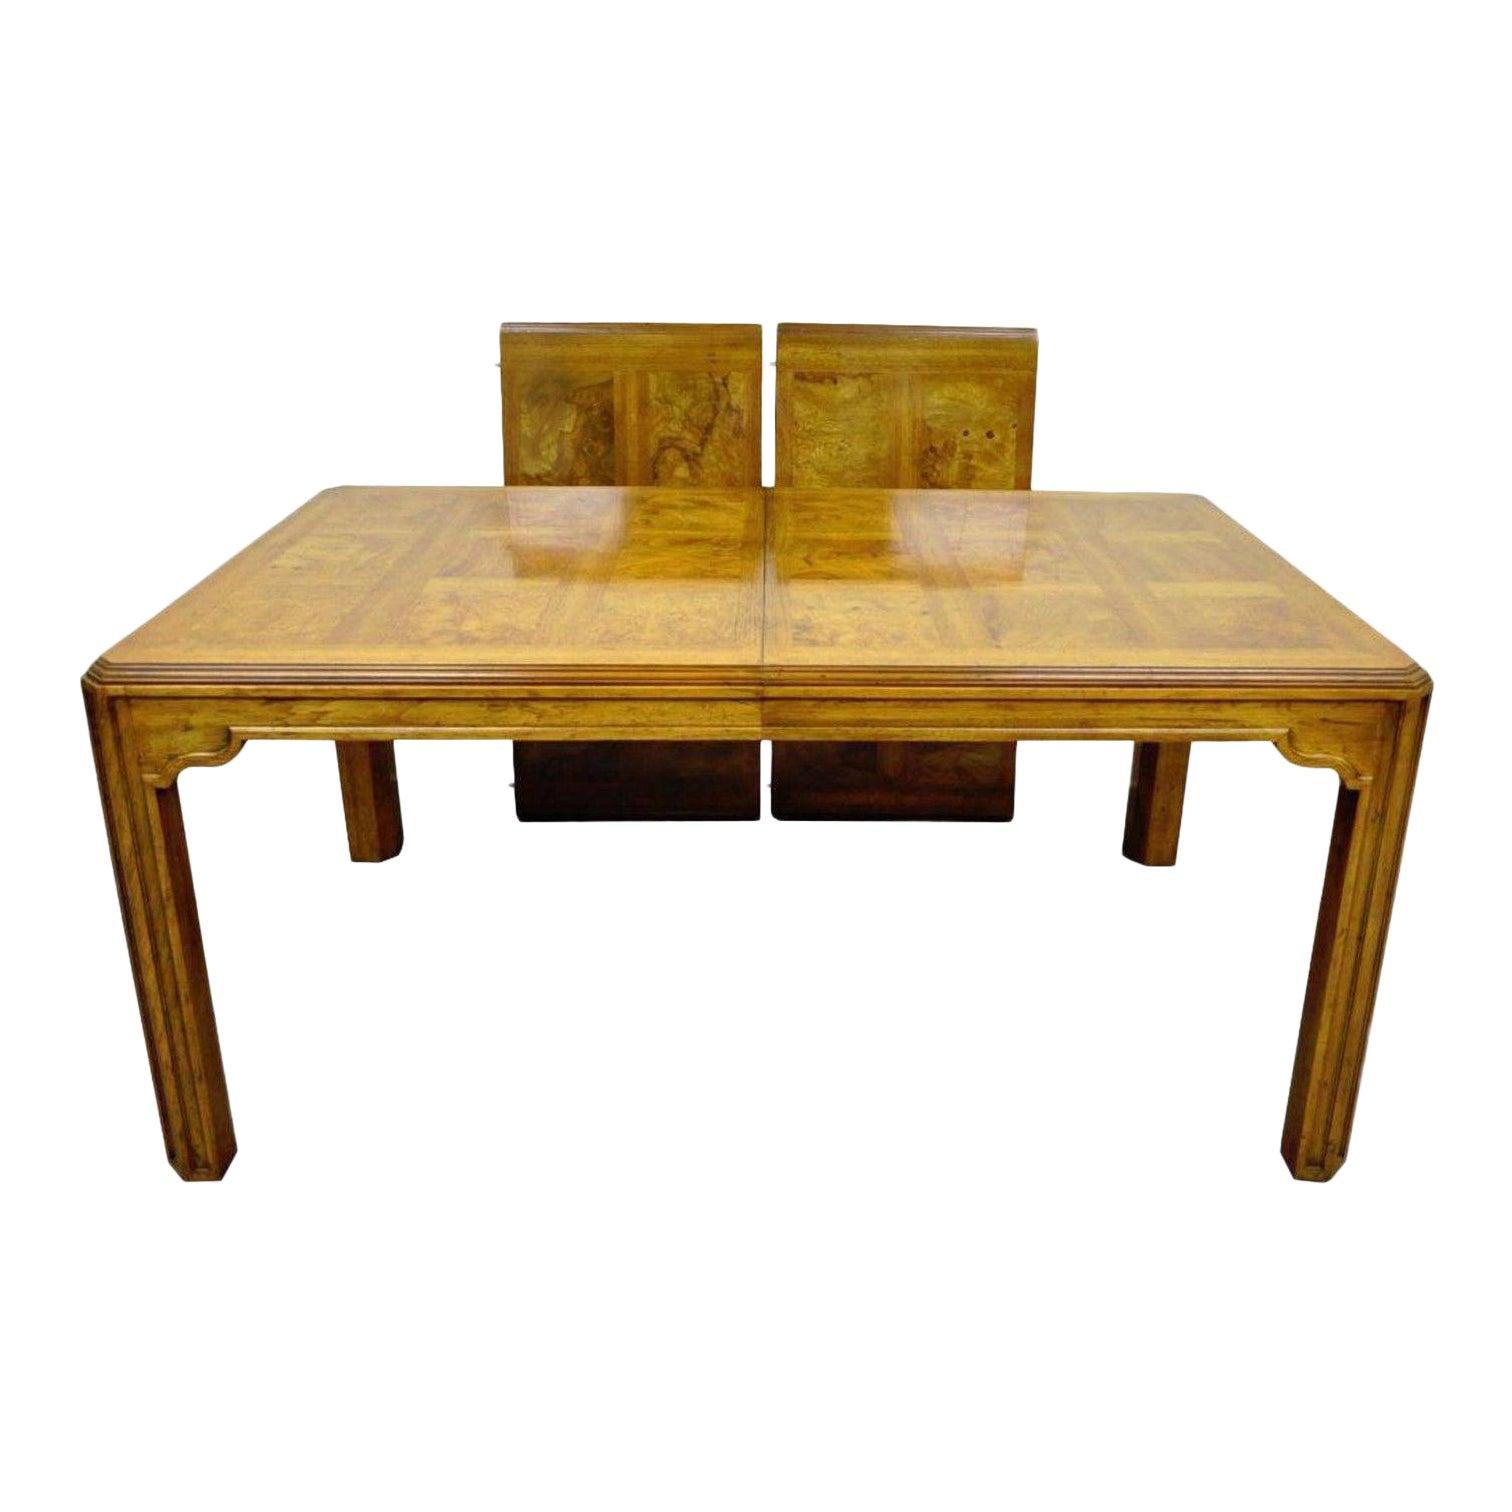 Vintage Drexel Heritage Sketchbook Dining Room Table Banded Burlwood Parquetry Chairish